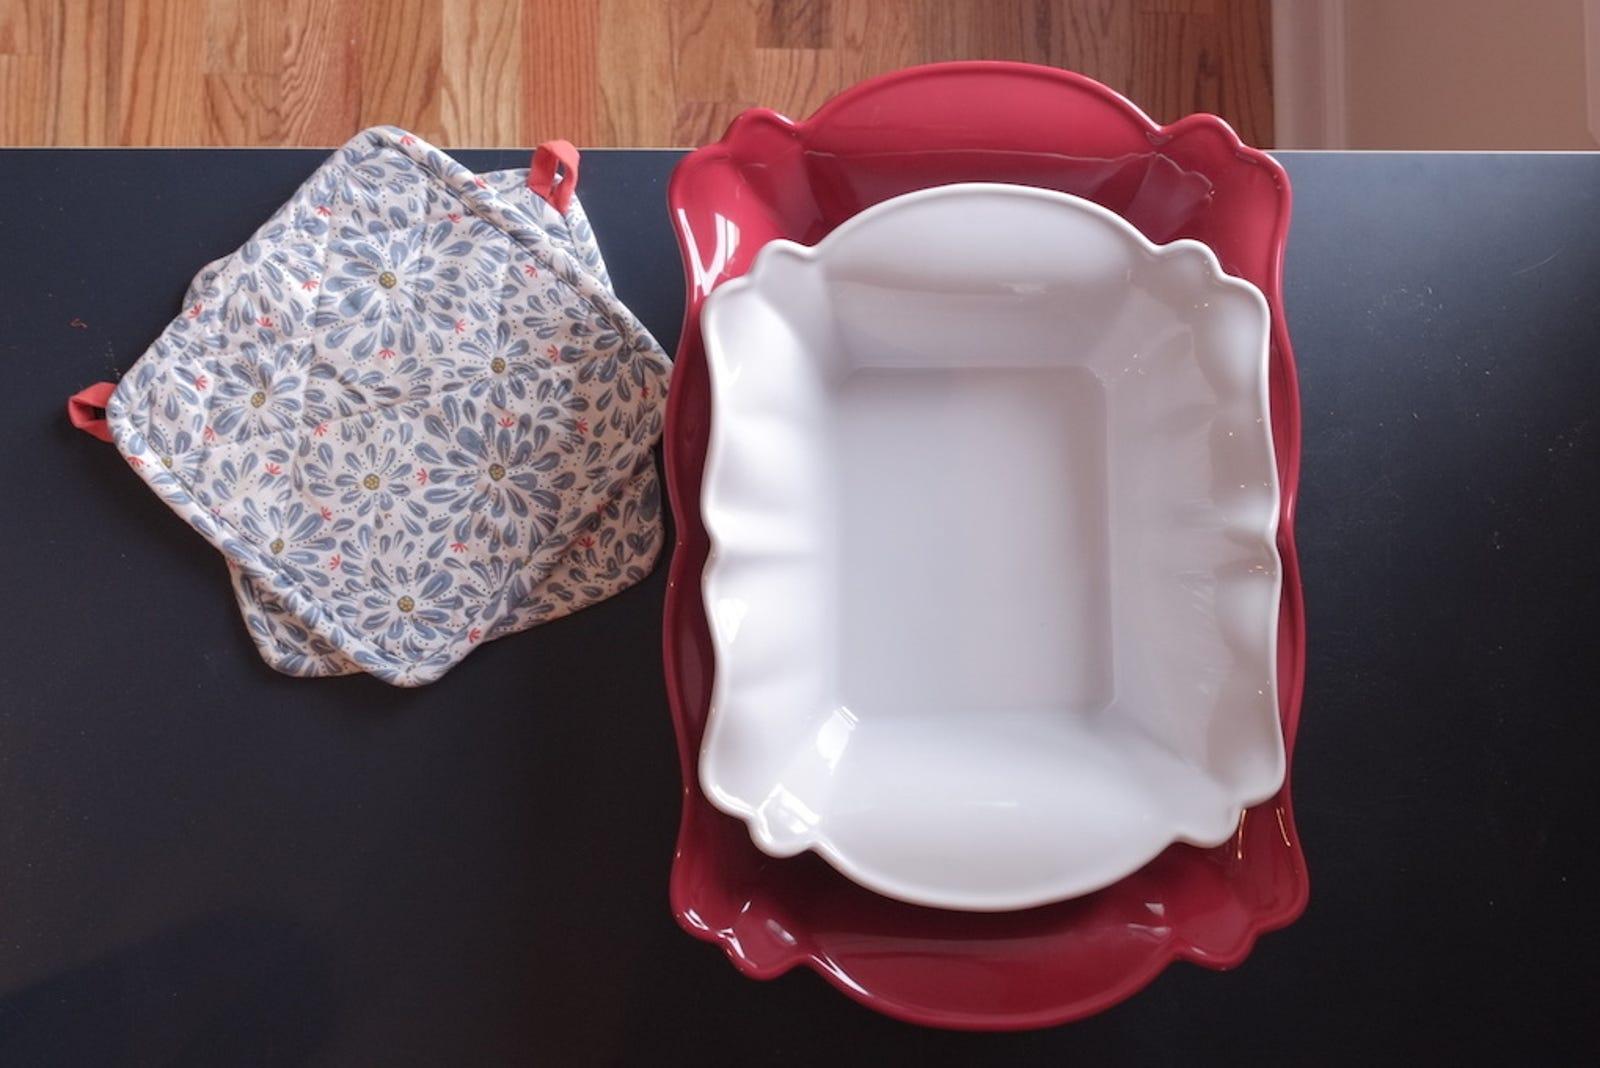 Crofton ceramic bakeware, $12.99 for the set